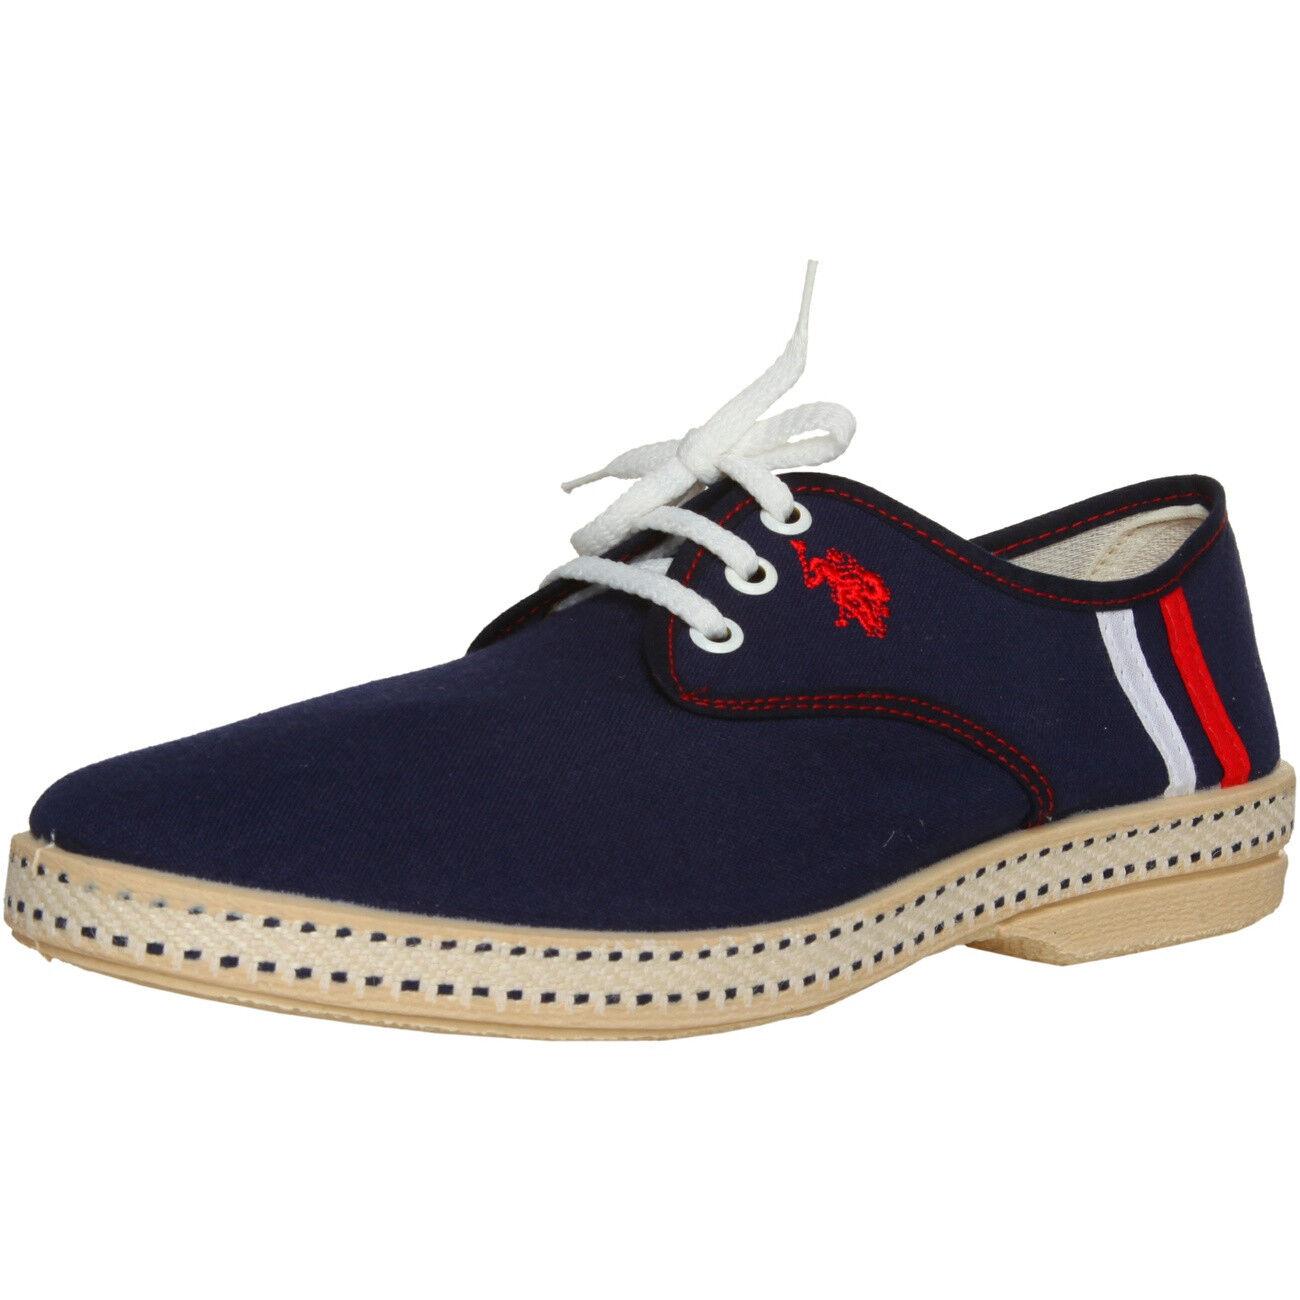 Scarpe casual da uomo U.S.POLO Ibiza Uomo Pantofola Sneakers Scarpe Basse Blue, Eu 41 42 45